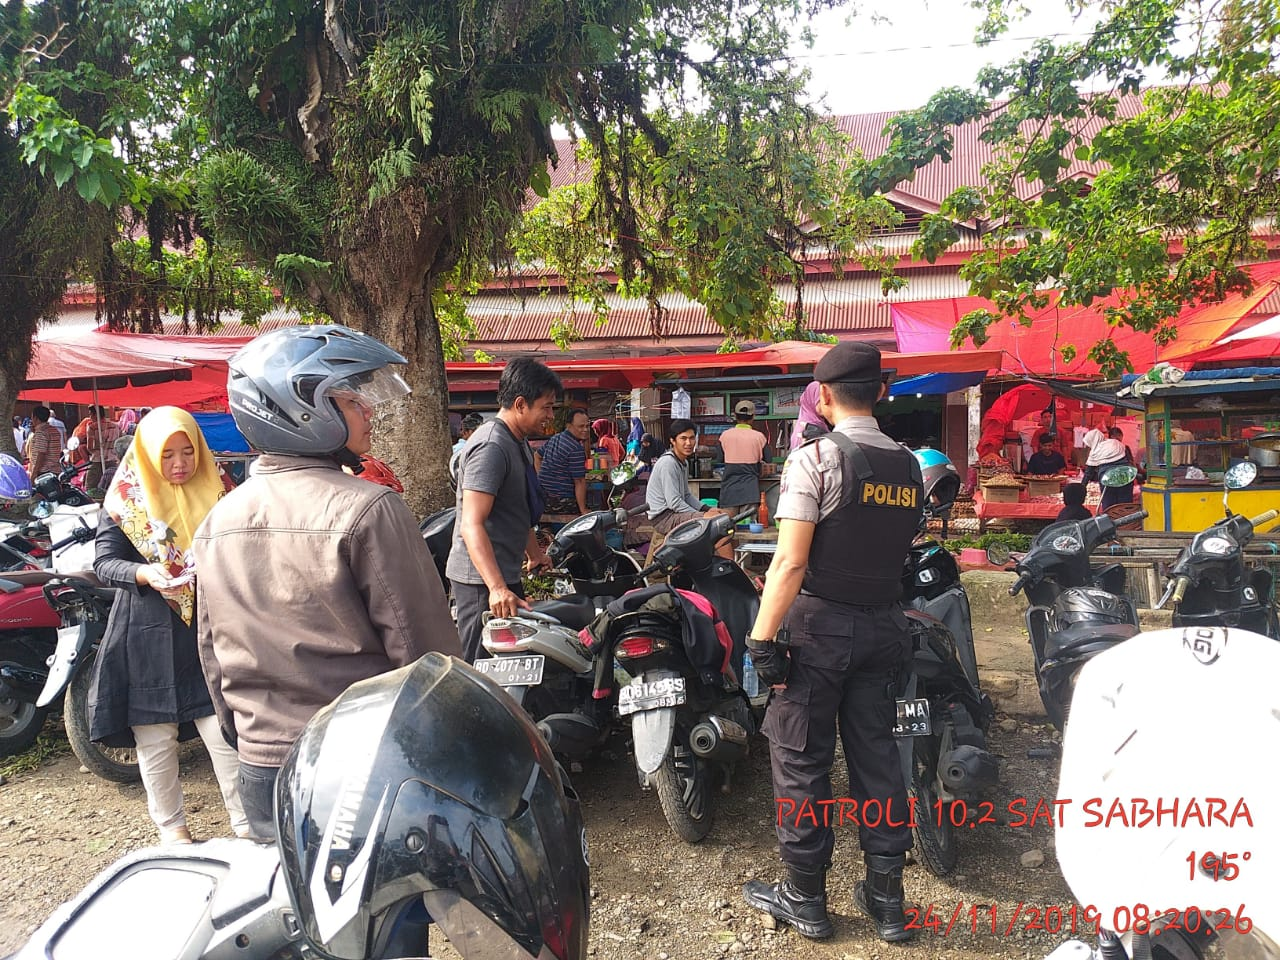 Cegah Aksi Premanisme, Tim Patroli Polres BS Sambangi Pasar